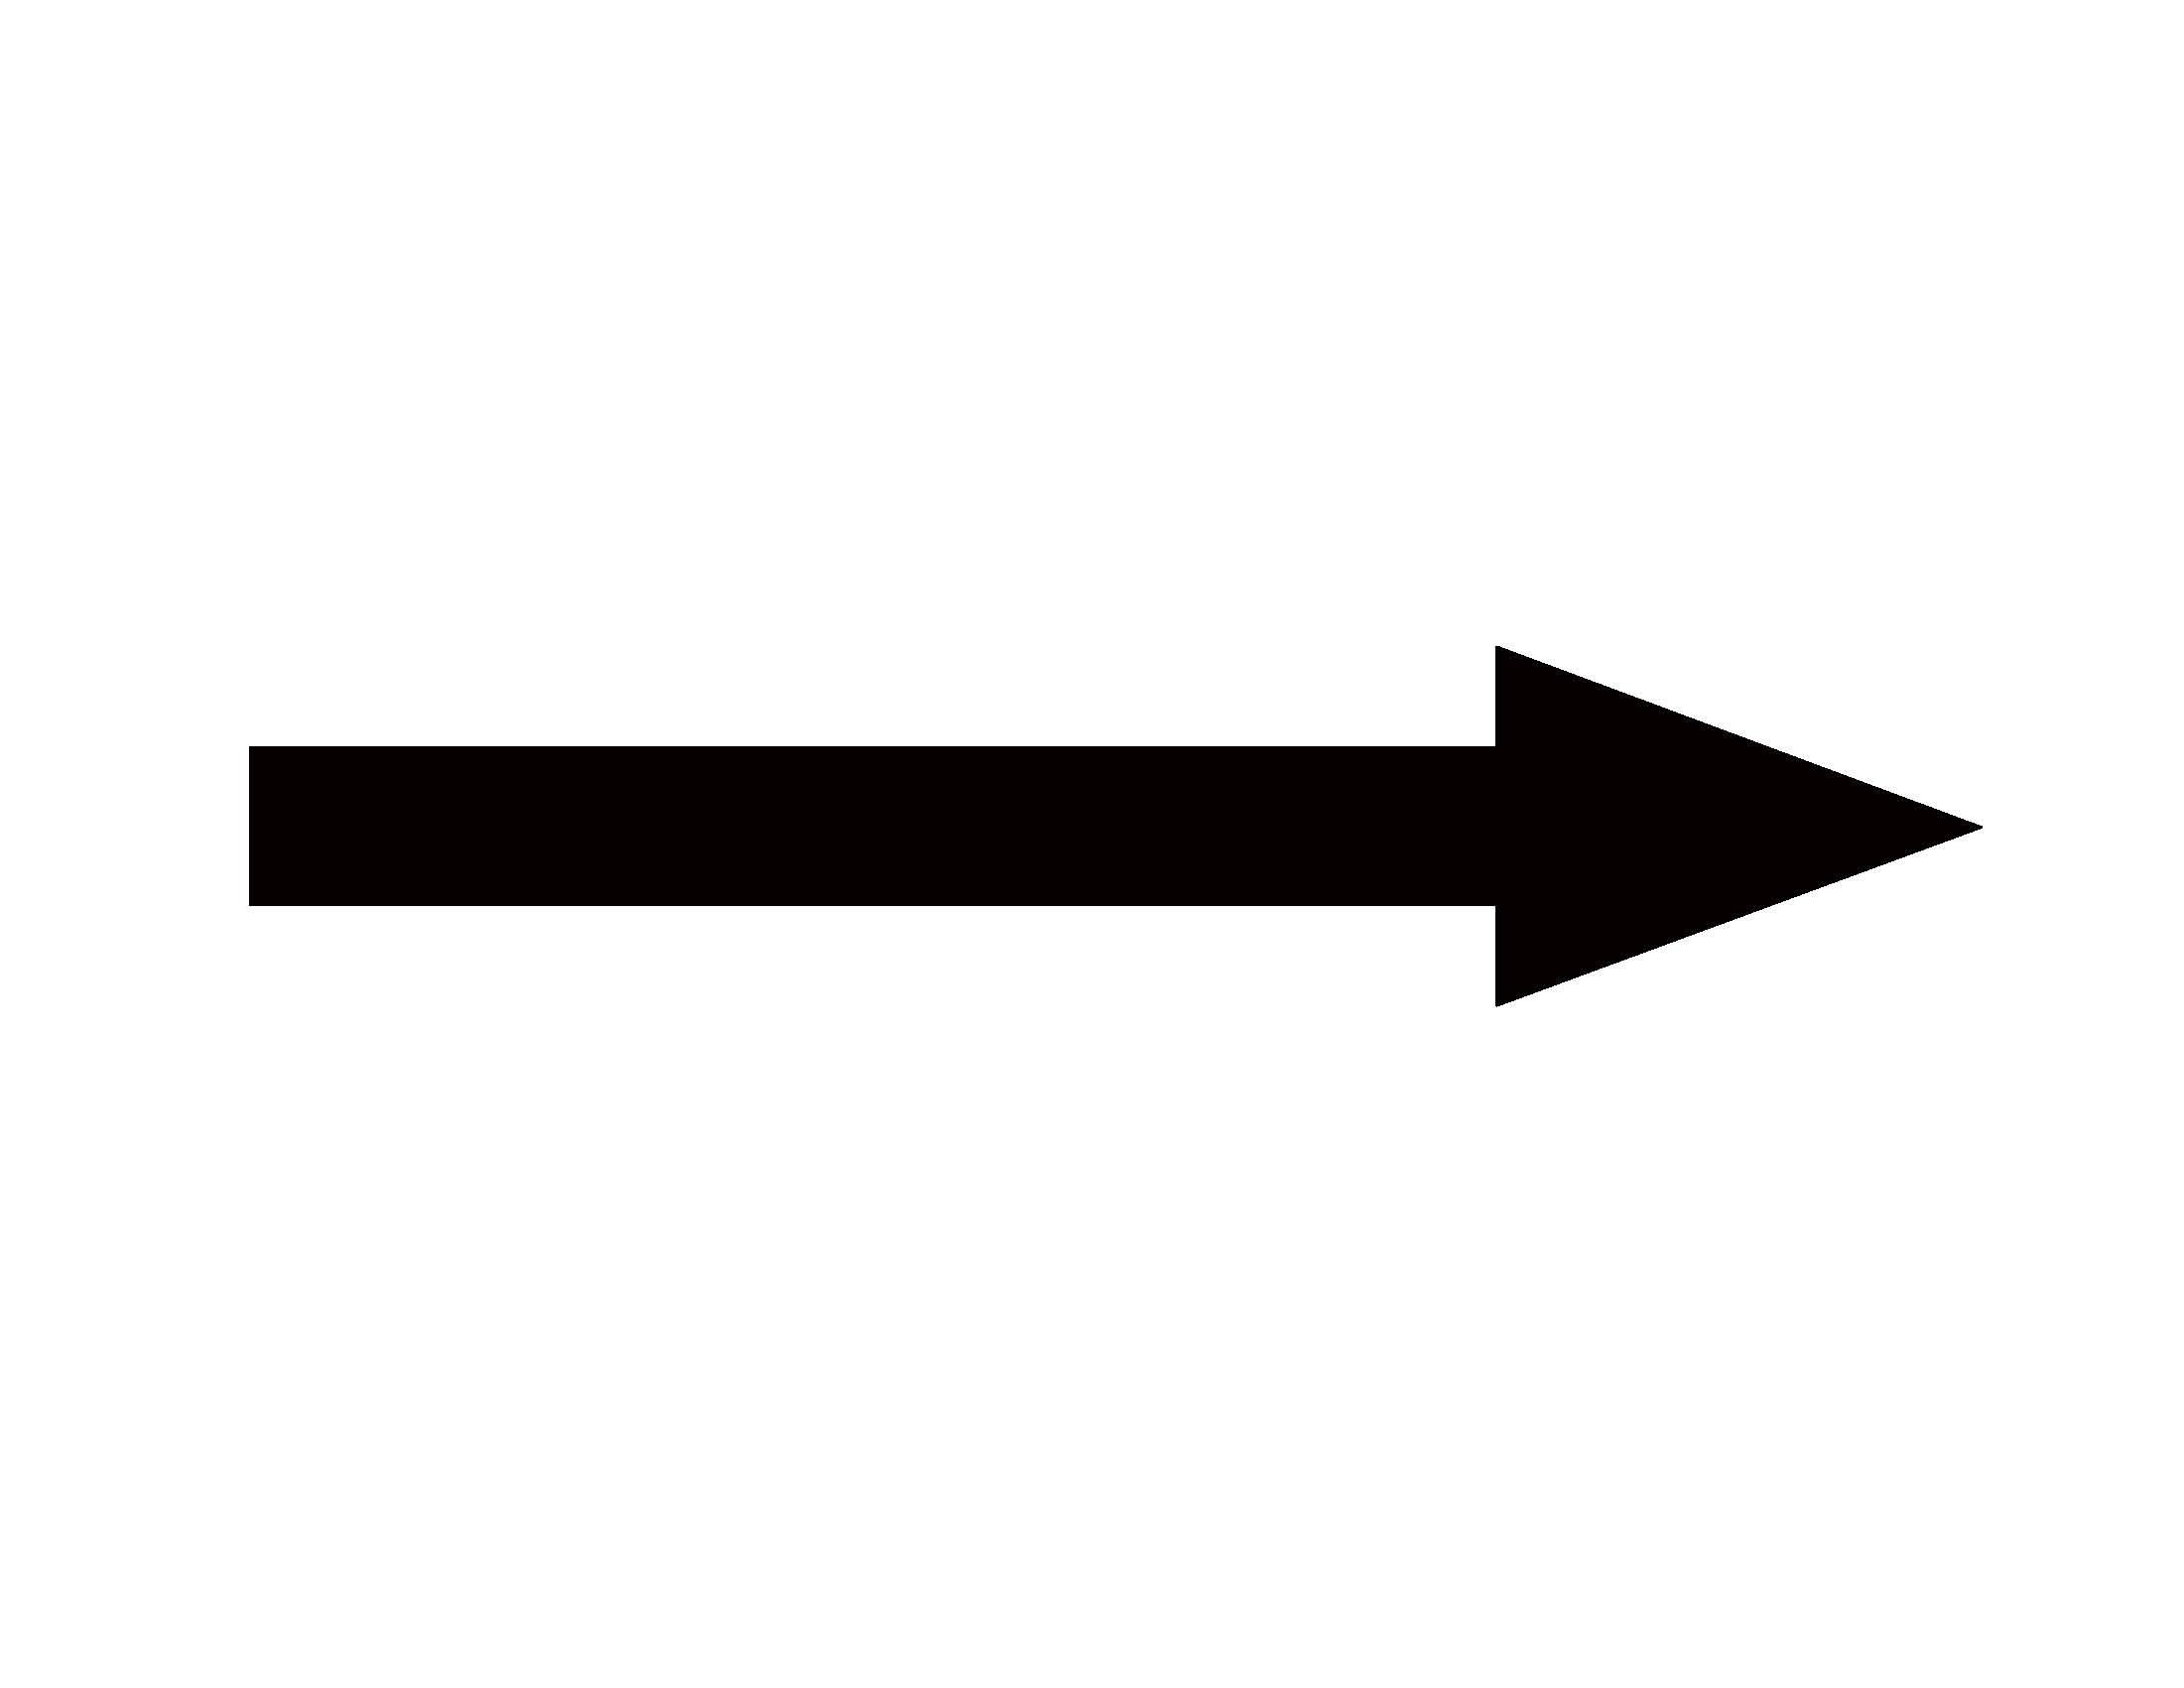 Arrow 971033 Arrow 971026 Arrow 971041 Arrow 971016 Arrow 971028 2201x1701